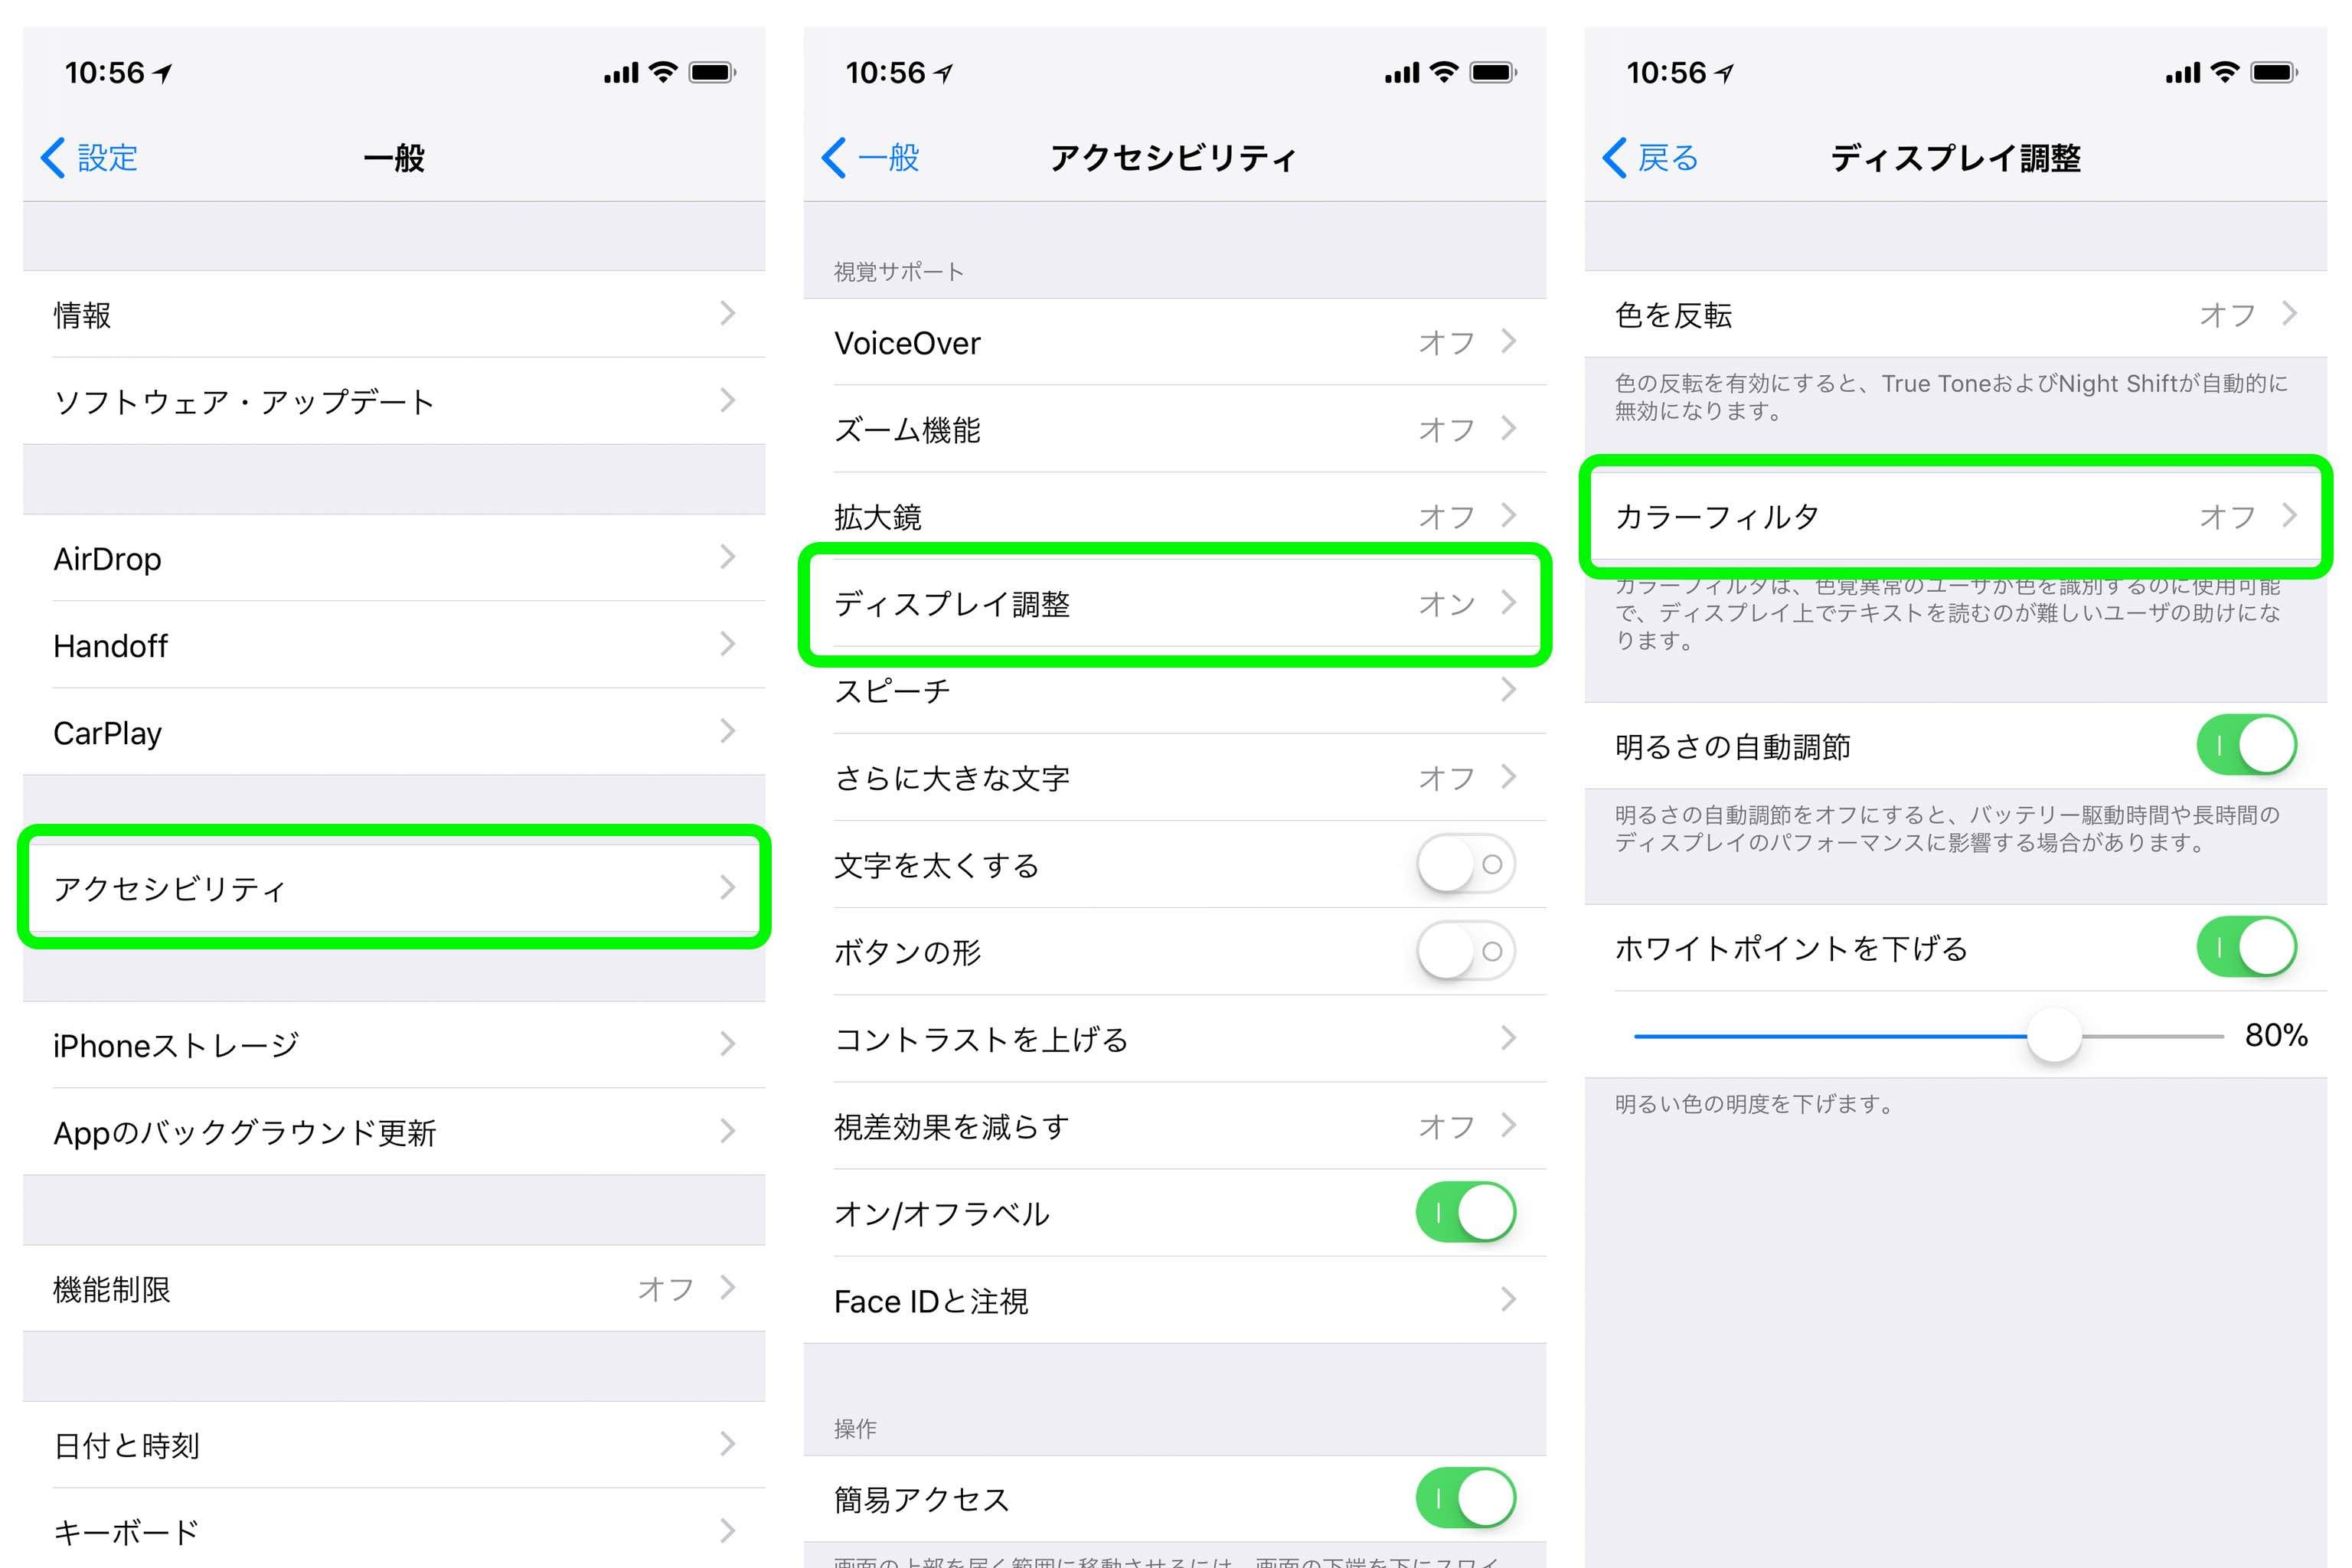 iPhoneXカラーフィルタ設定の画像